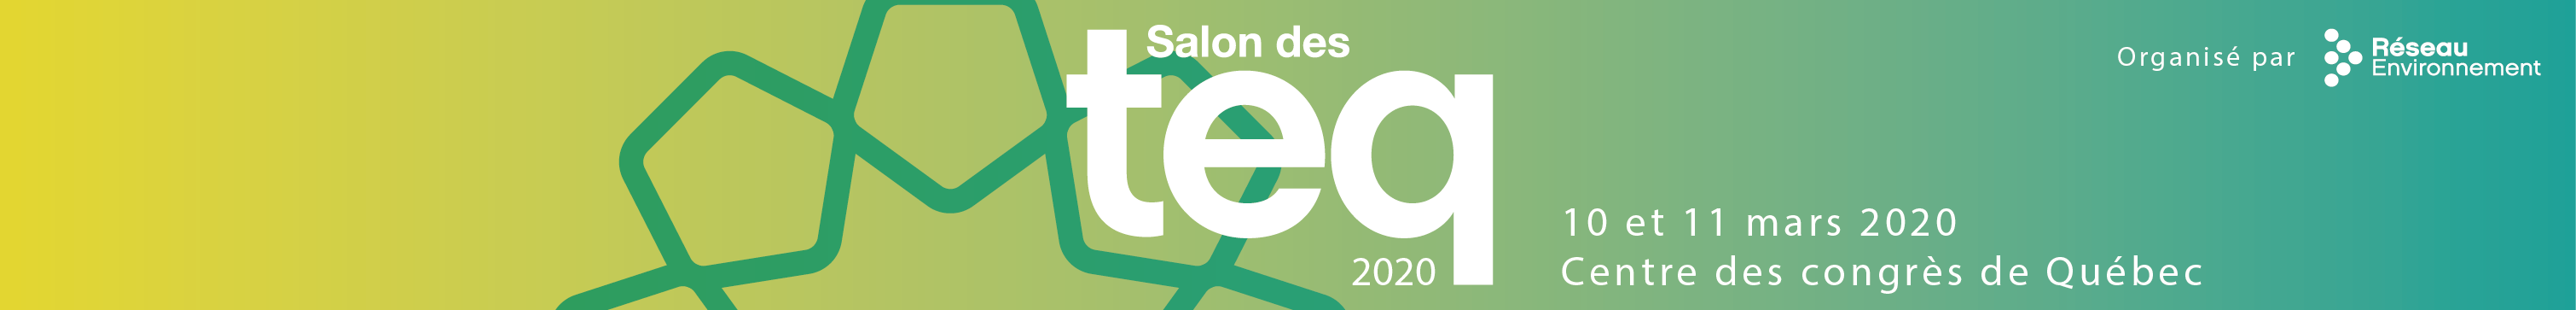 Salon des TEQ 2020